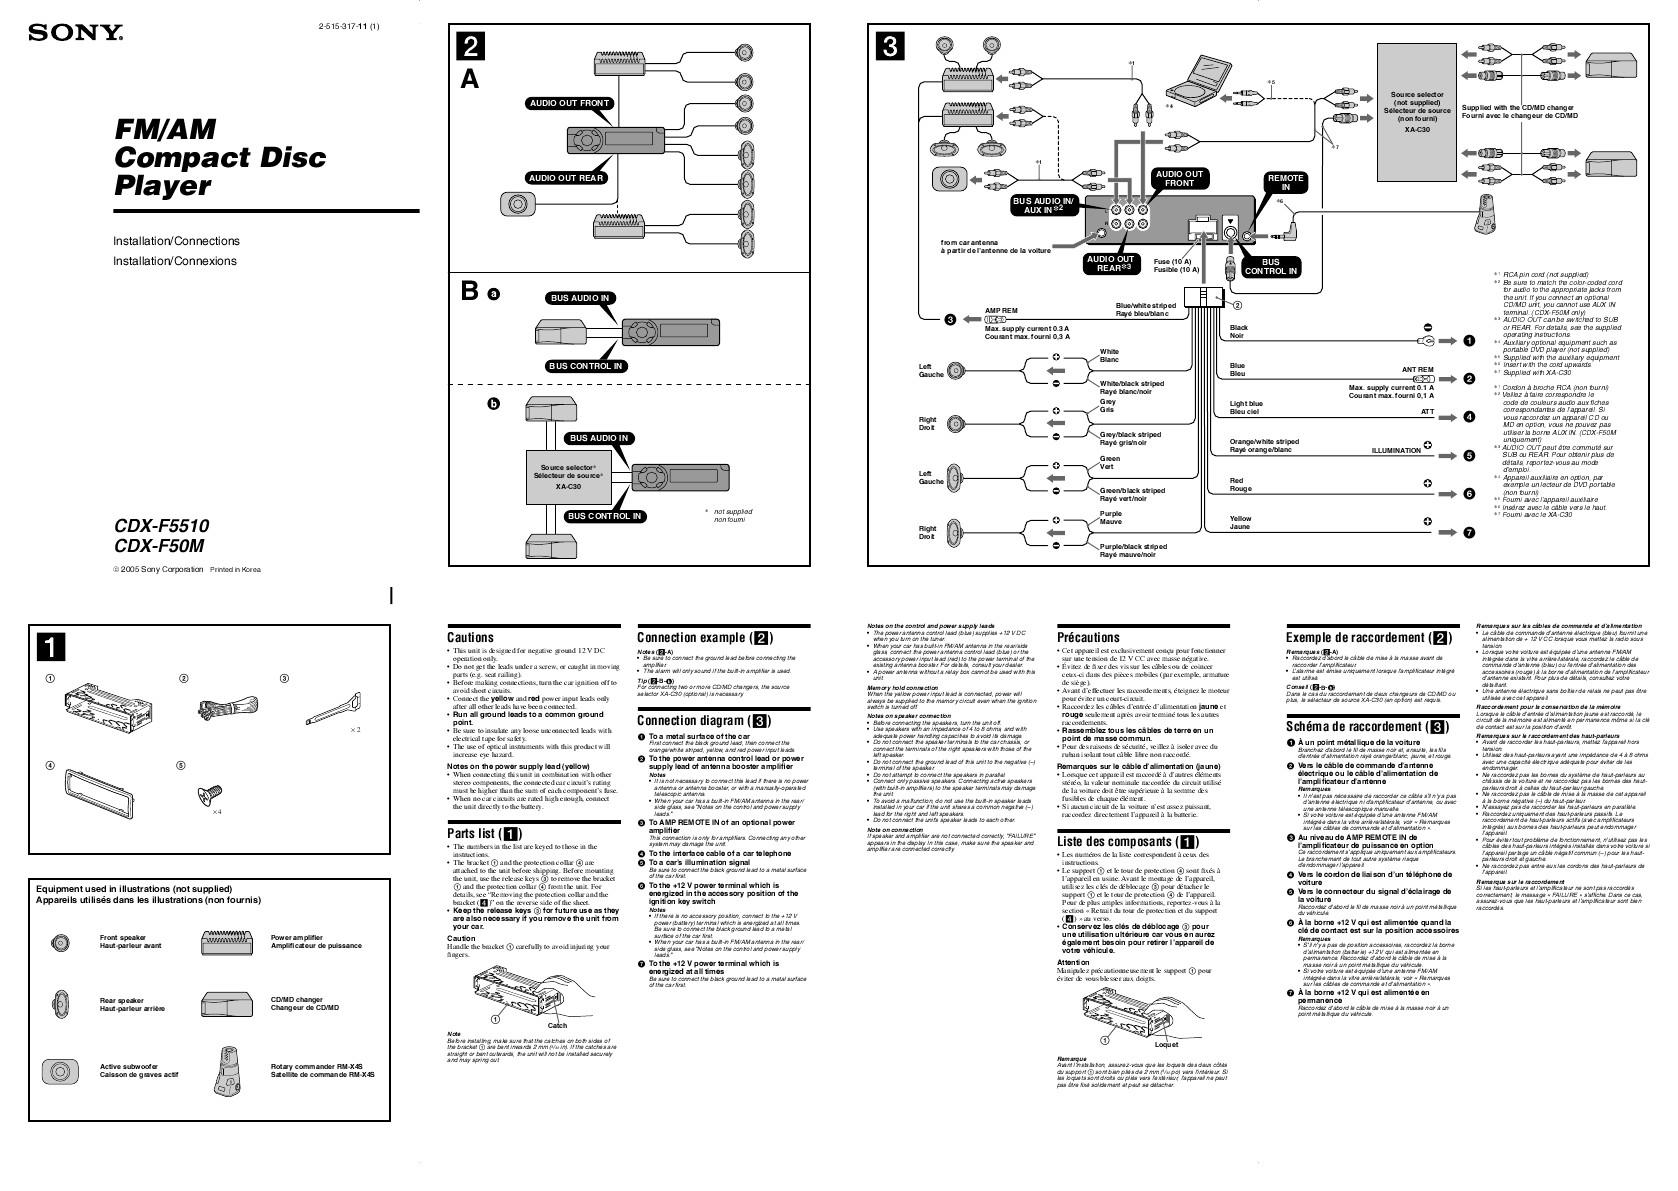 Sony Xplod Car Stereo Wiring Diagram Manual Library Radio Needs Free 52wx4 Pdf